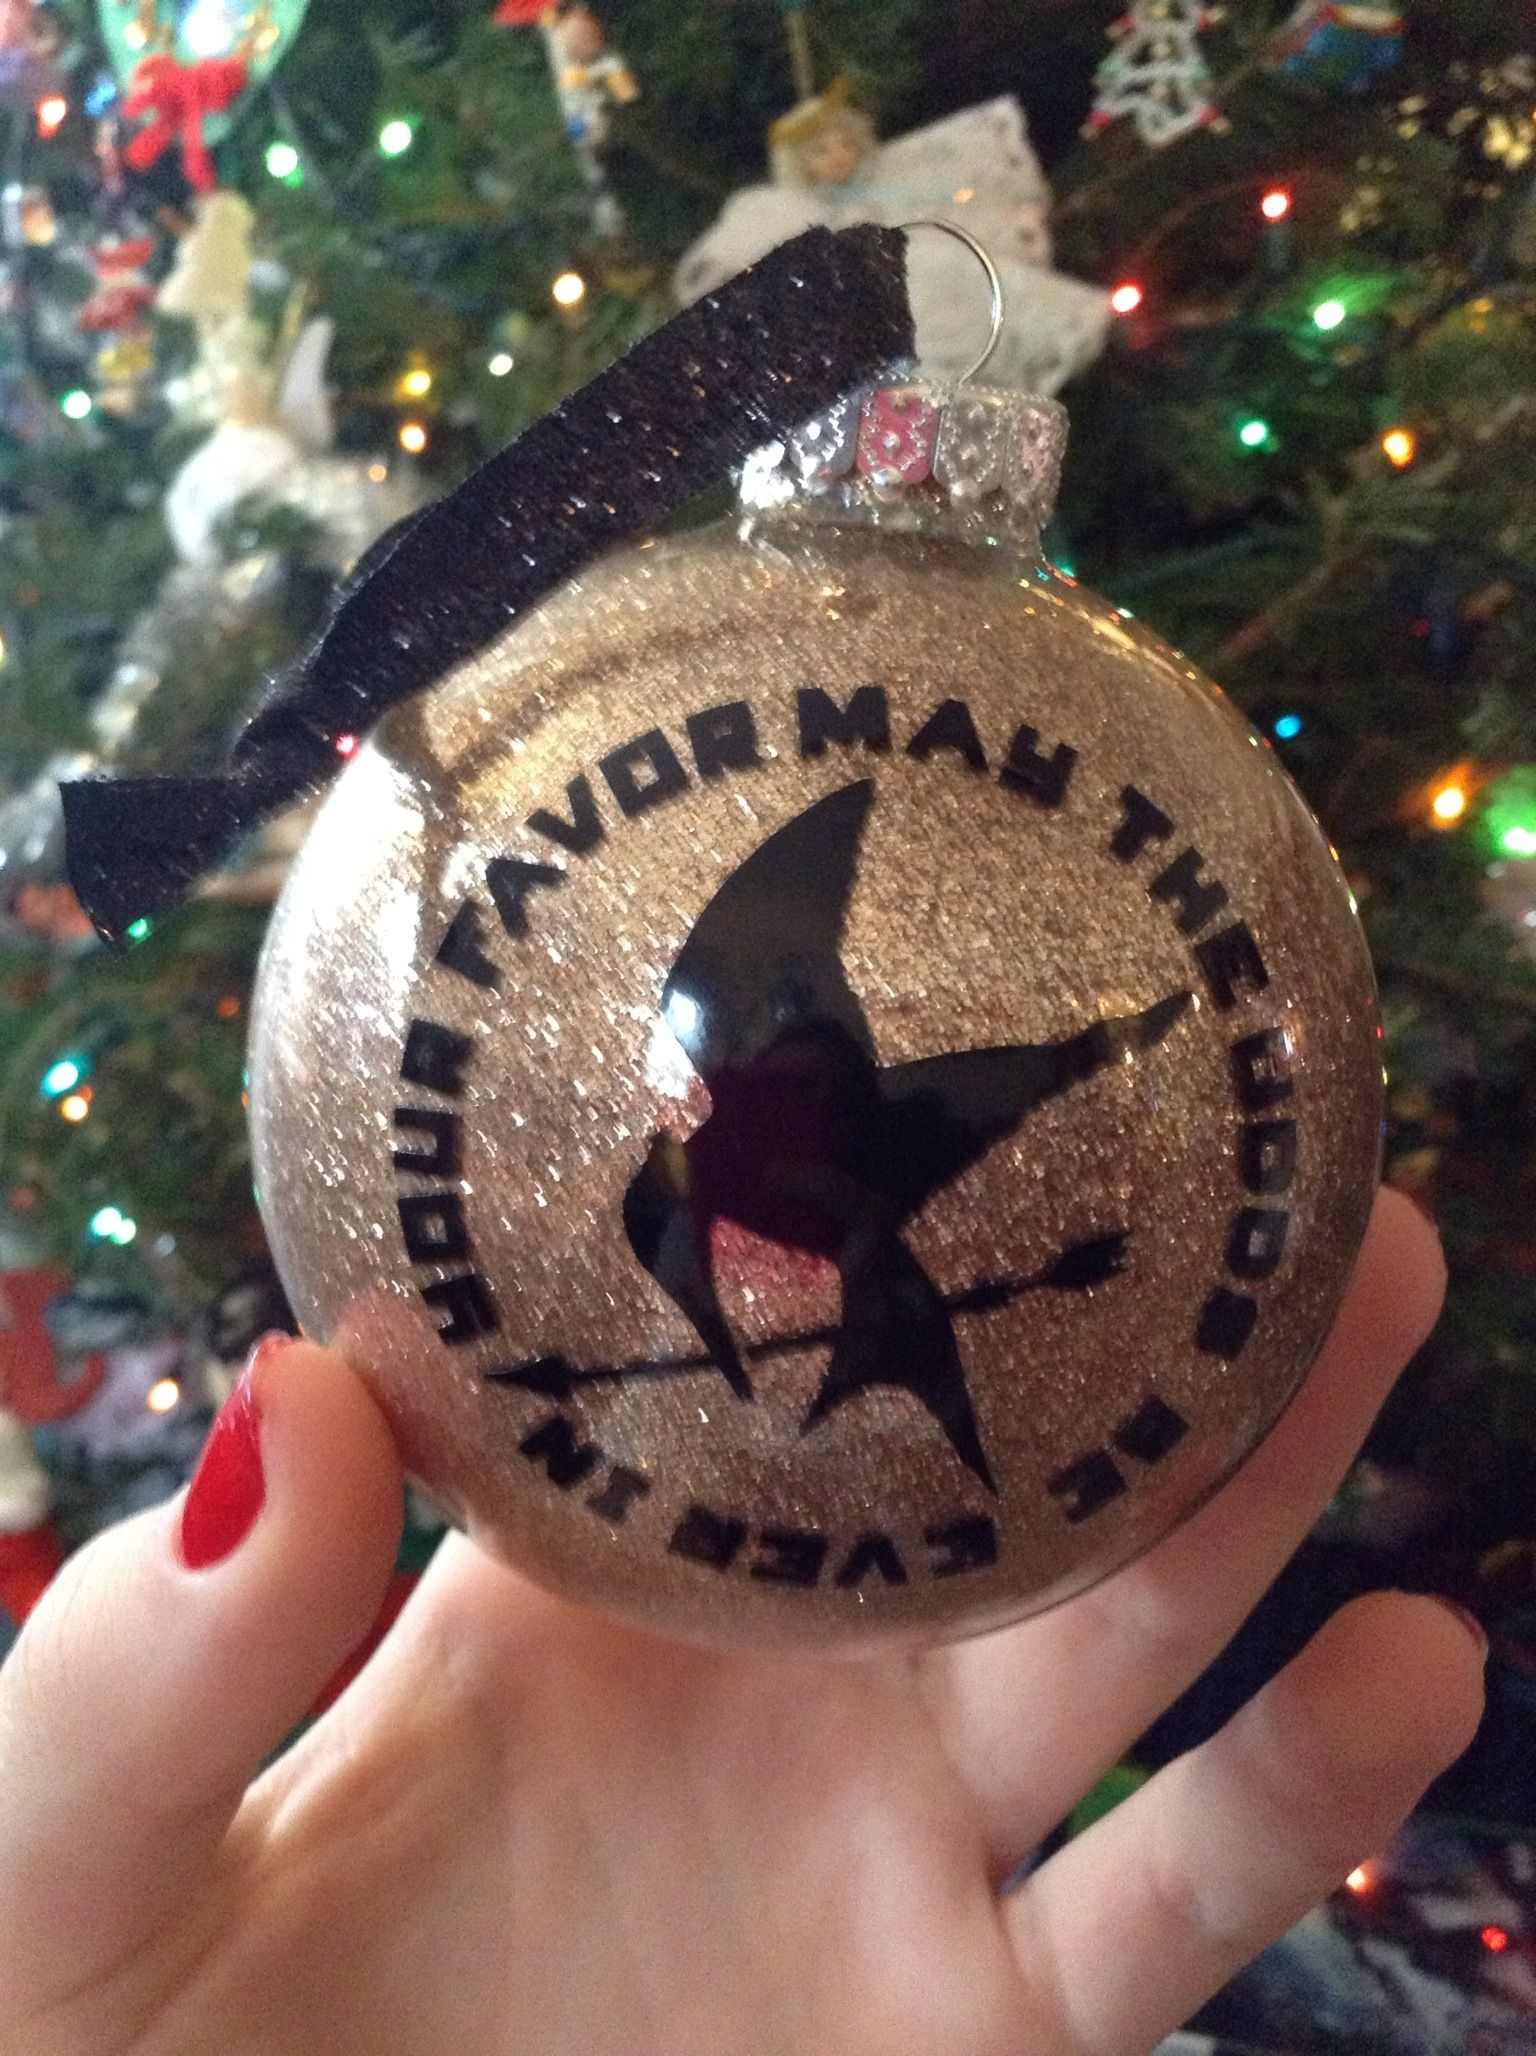 Hunger Games Ornament Love